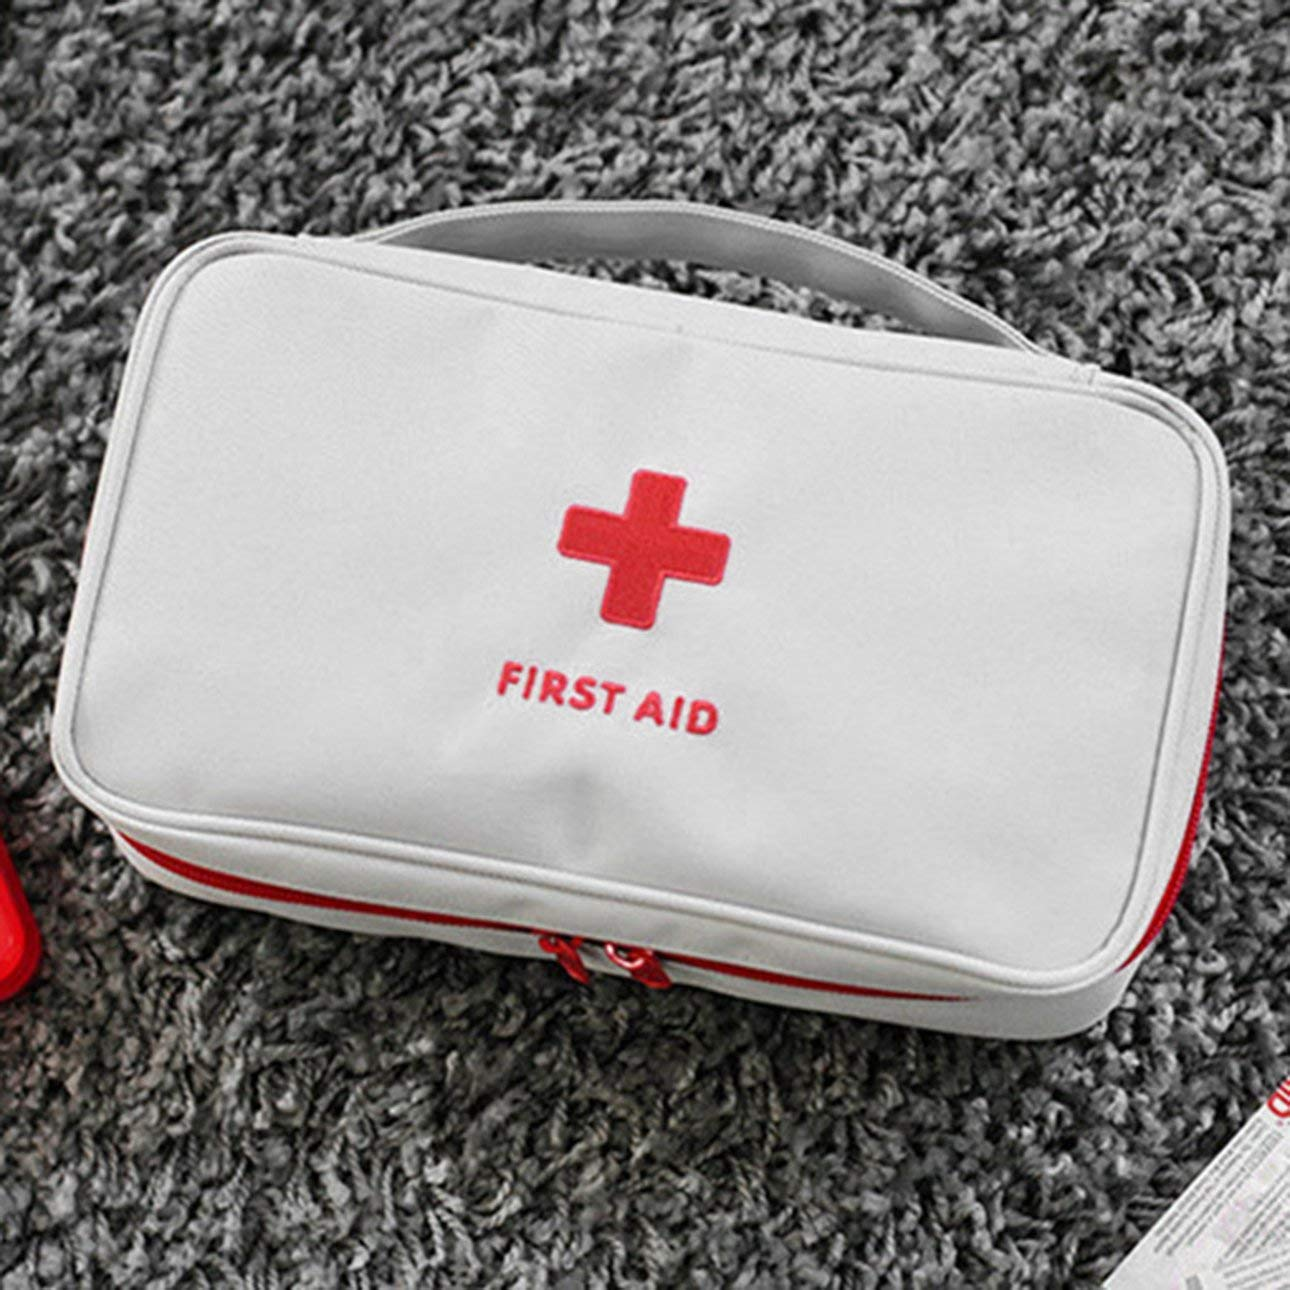 Celerhuak Kit de primeros auxilios al aire libre Bolsa Kit de emergencia m/édica Bolsa de supervivencia Bolso Bolso de almacenamiento de medicina de viaje Peque/ño organizador con mango